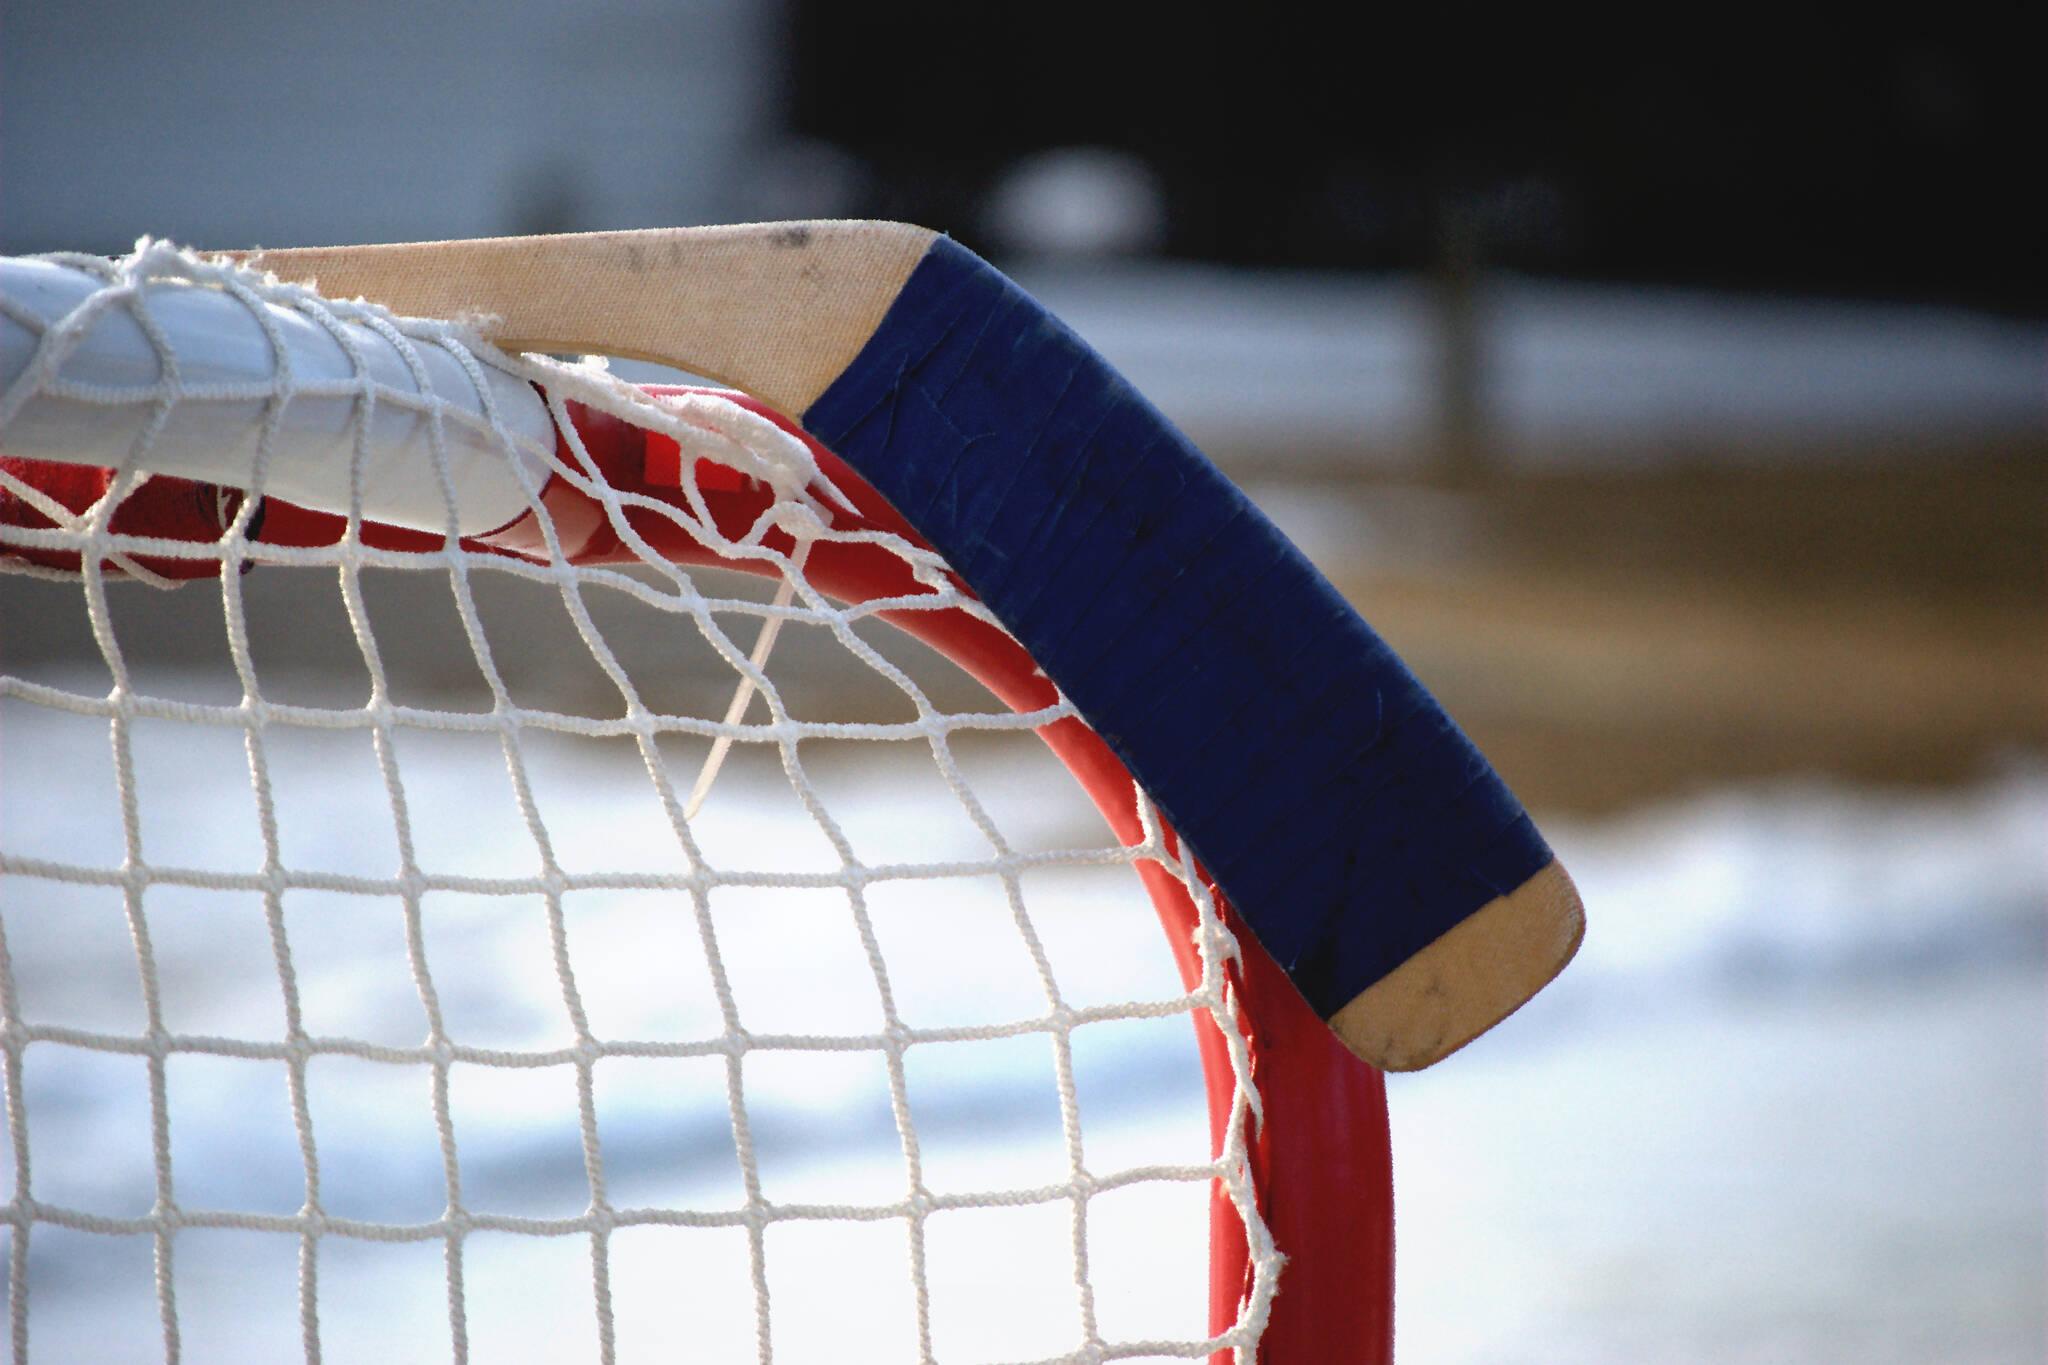 hockey stick fight